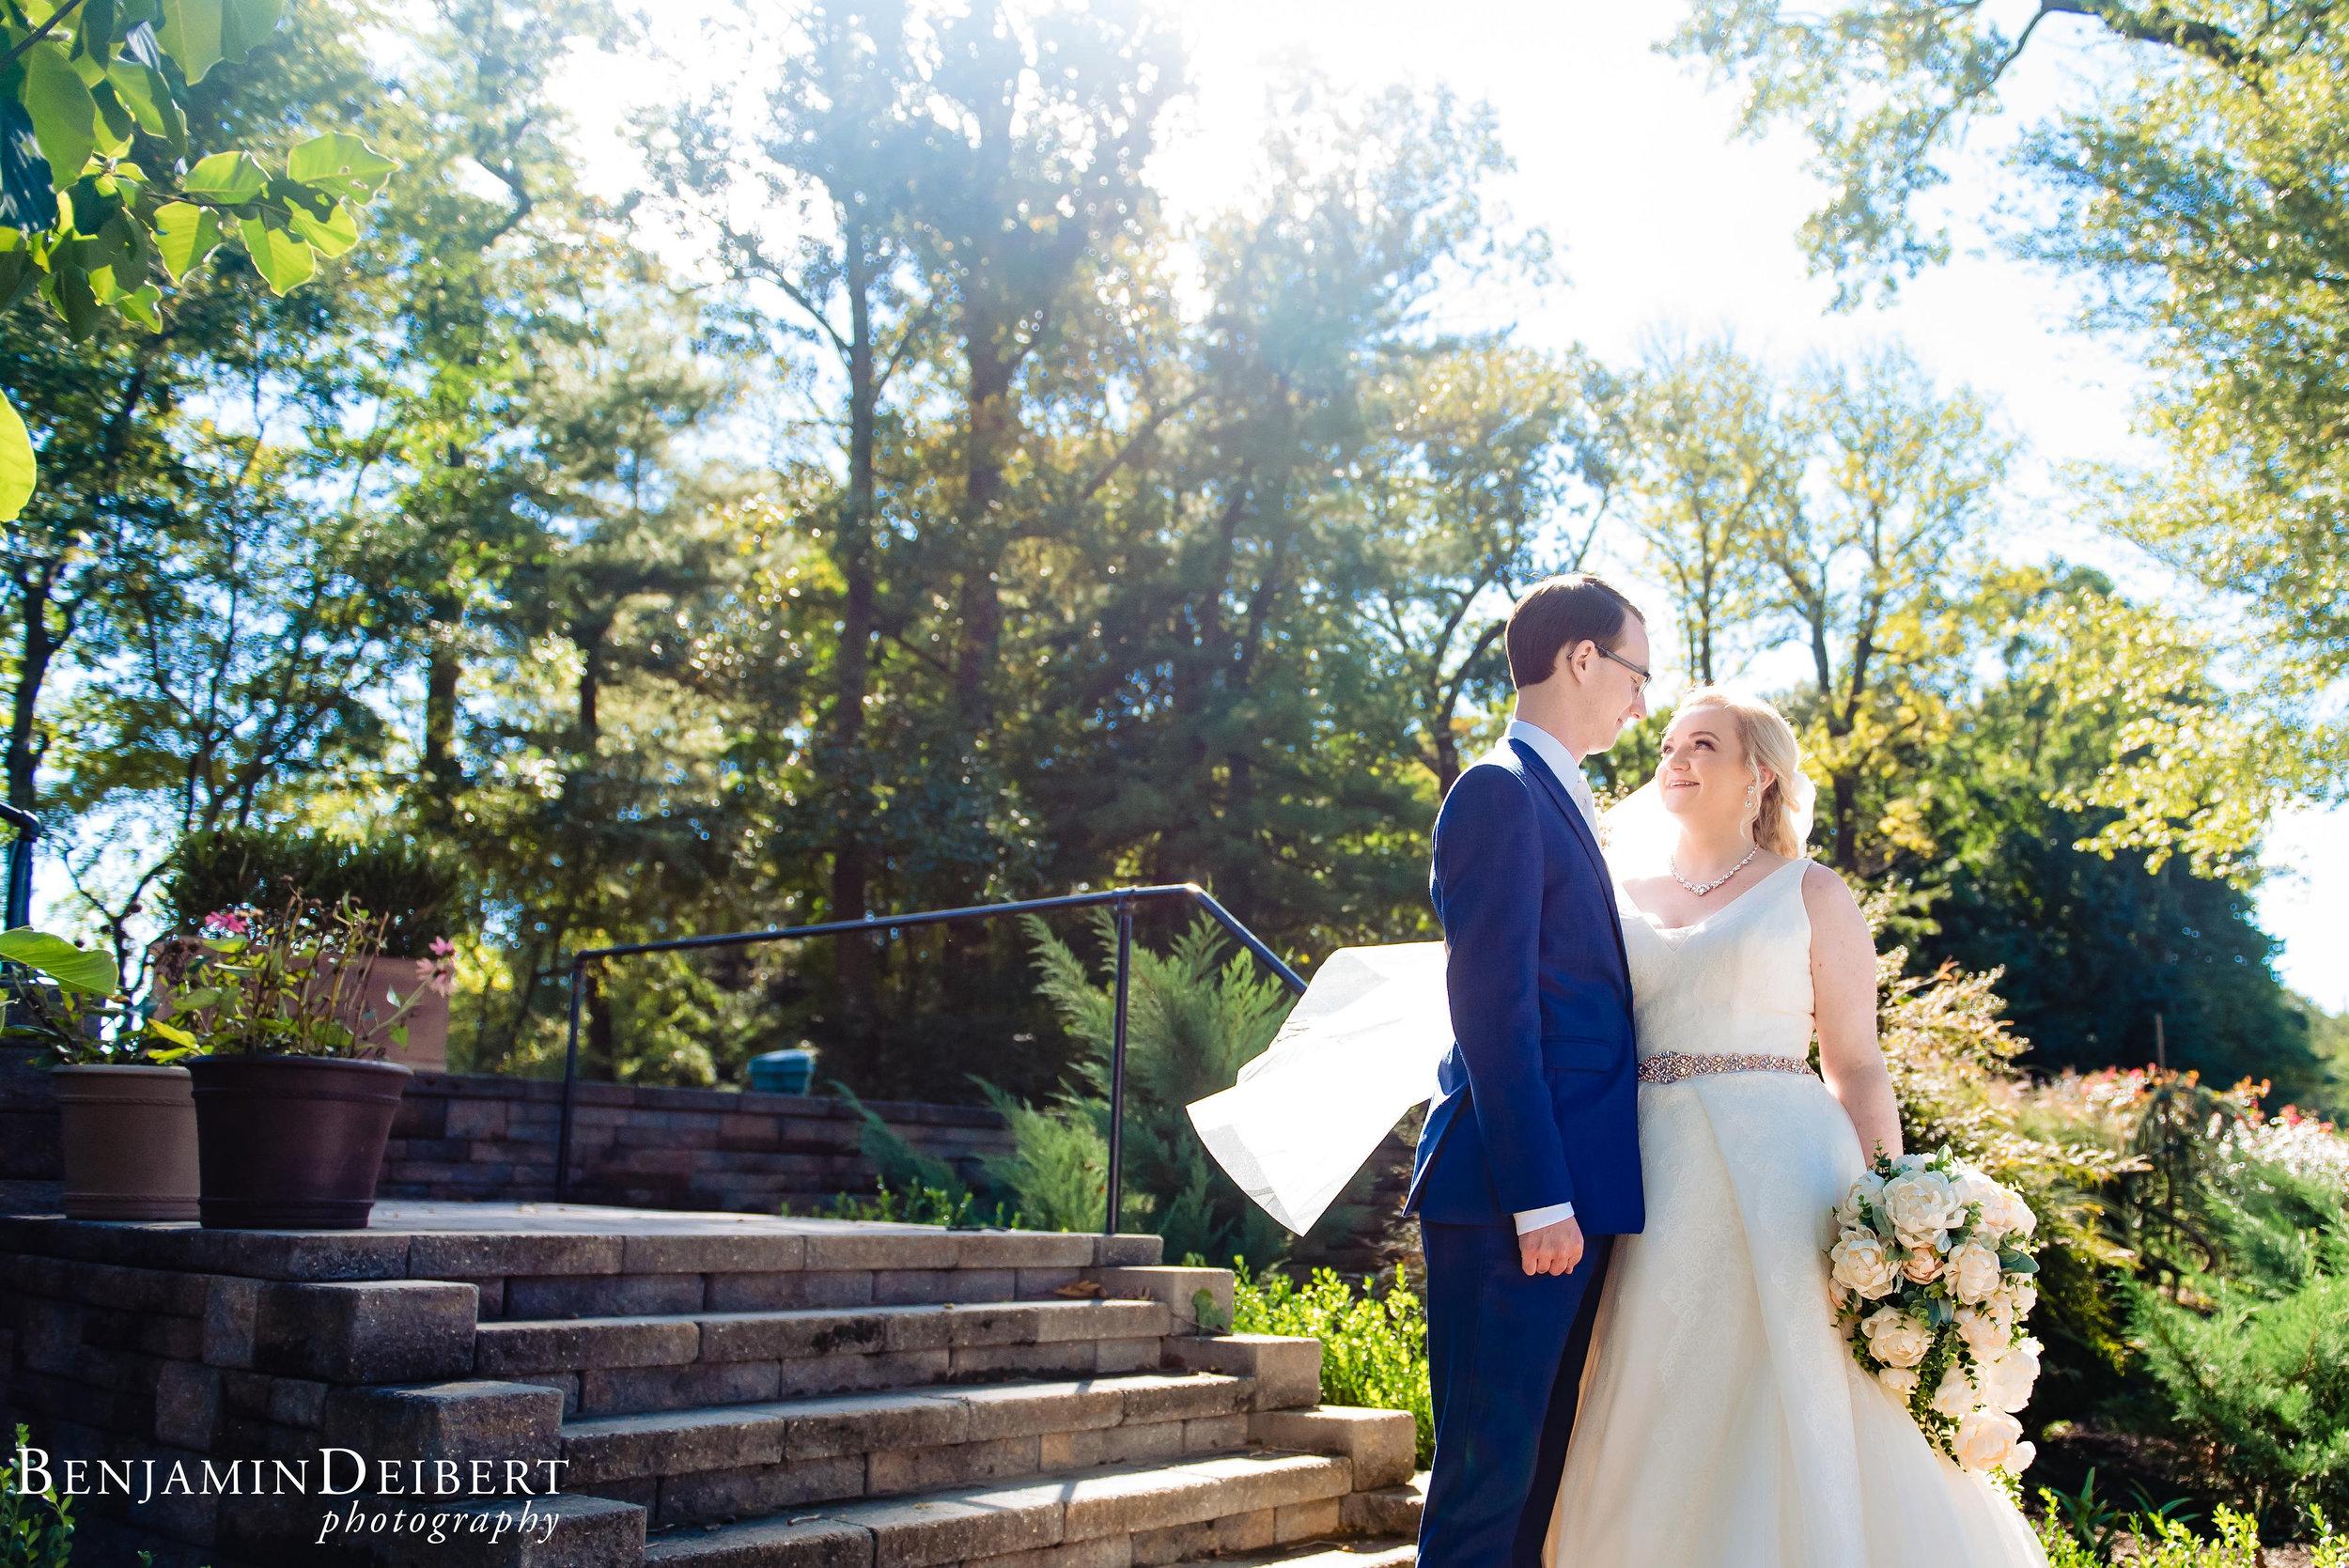 AshleyandDerrick_RadnorValleyCountryClub_Wedding-31.jpg